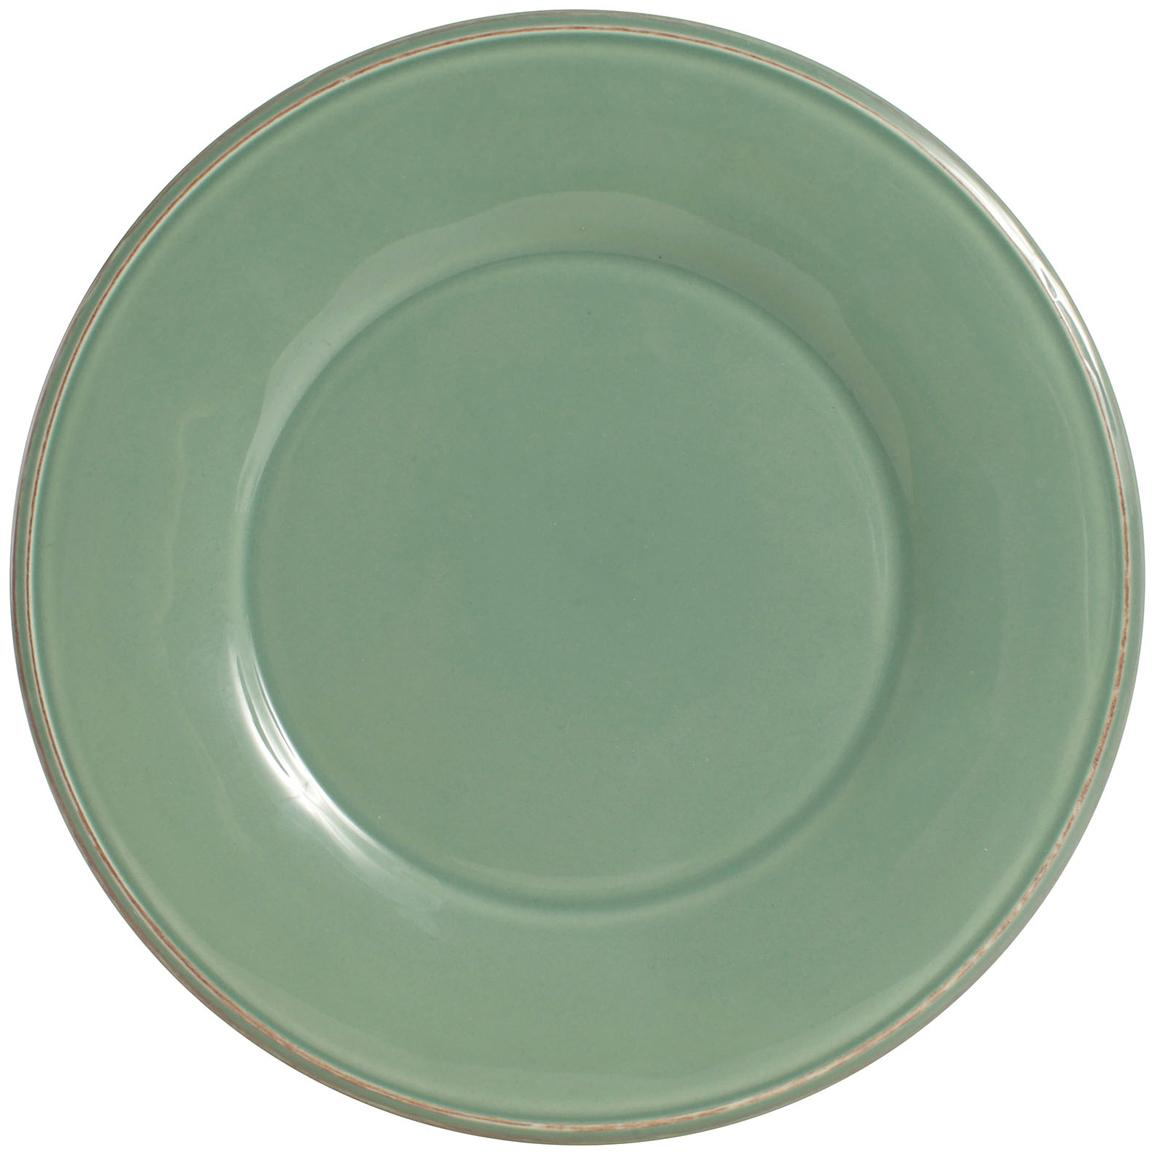 Piattino da dessert verde salvia Constance 2 pz, Terracotta, Verde salvia, Ø 24 cm